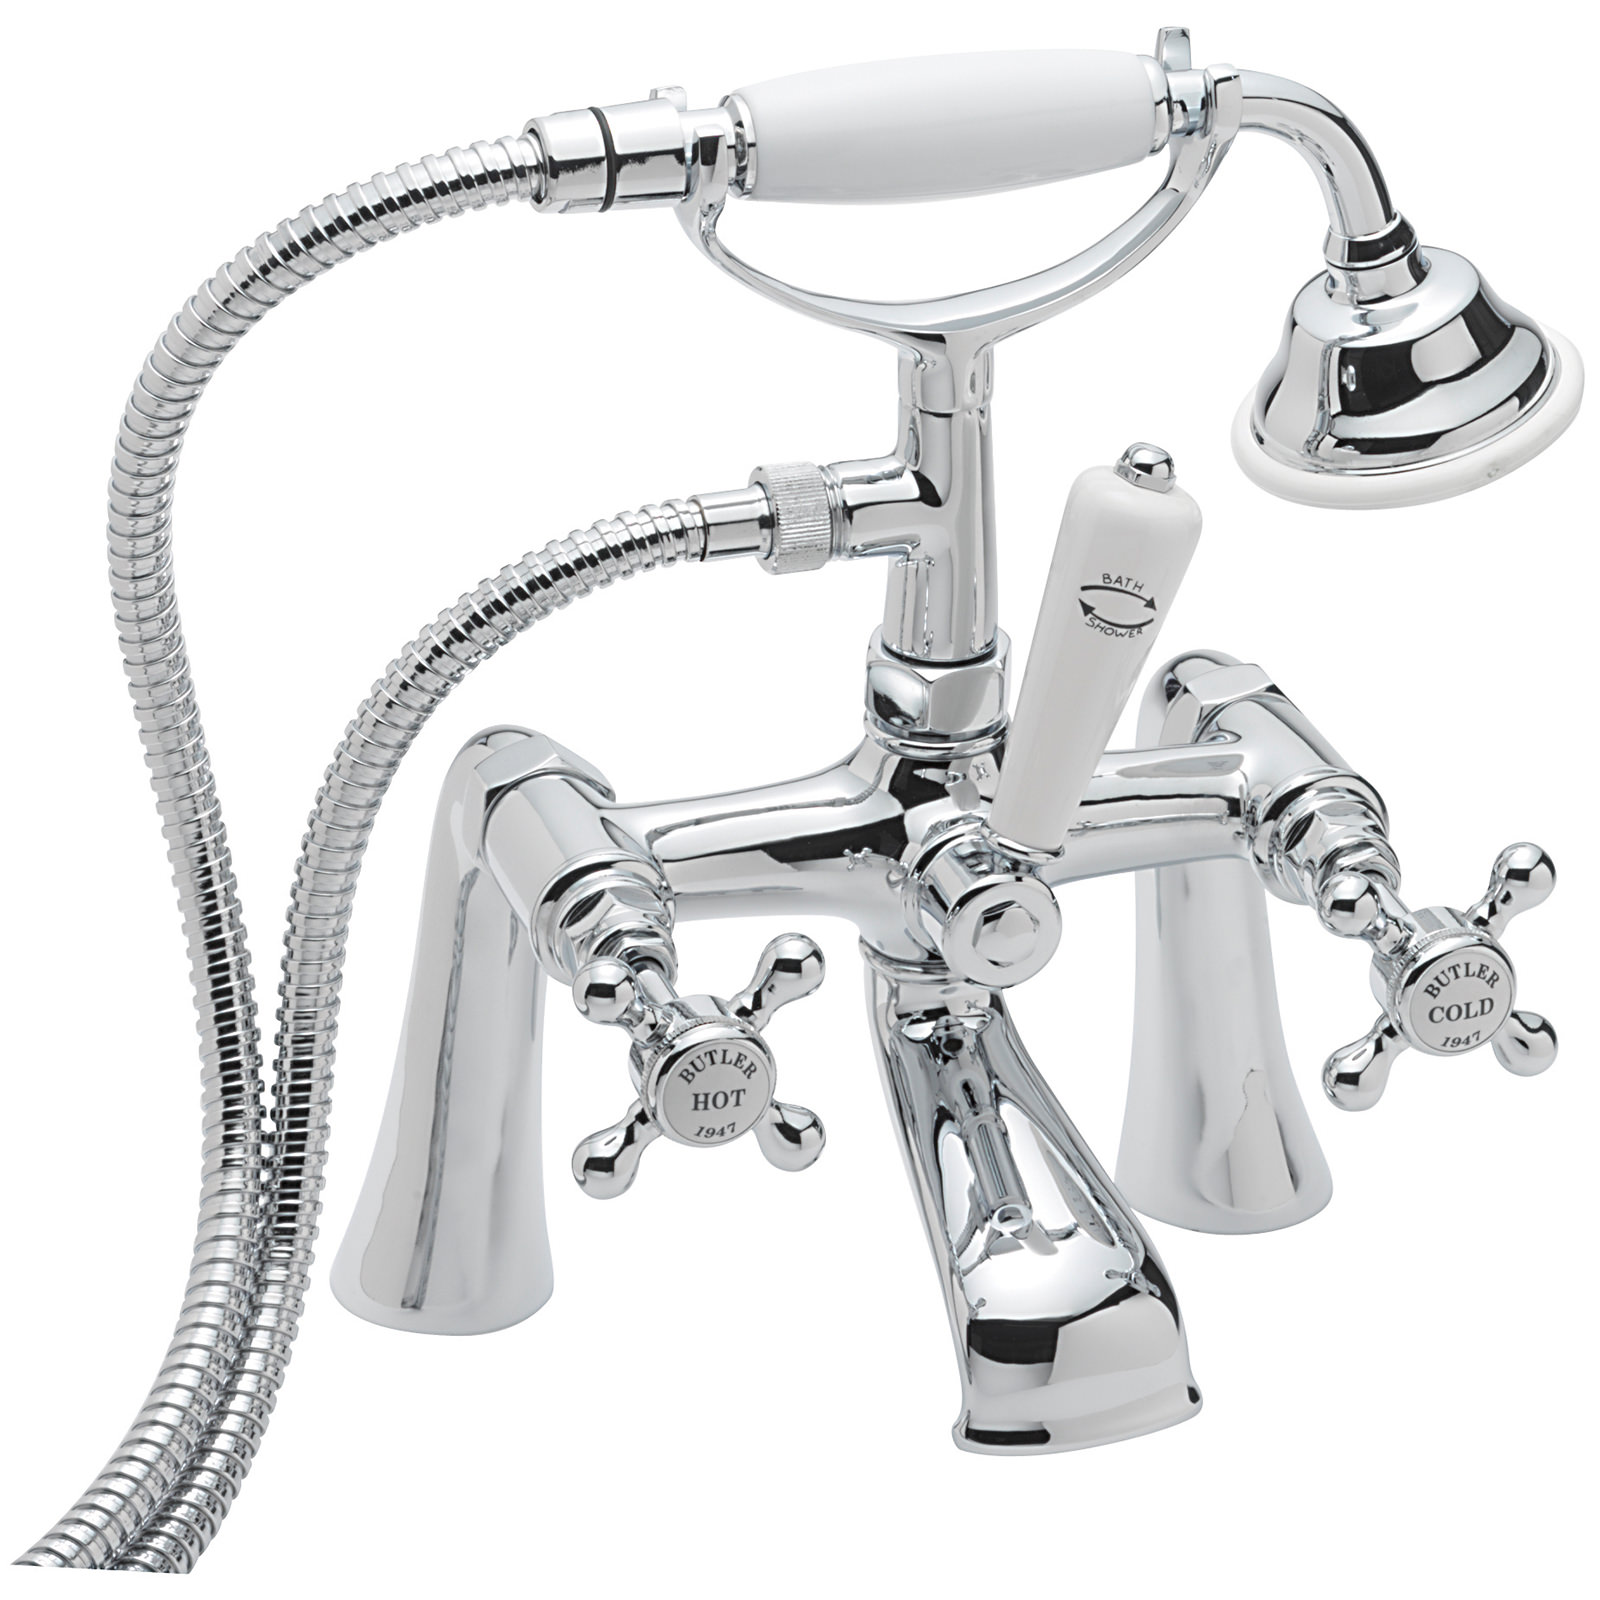 Sagittarius Butler Bathroom Taps - QS Supplies